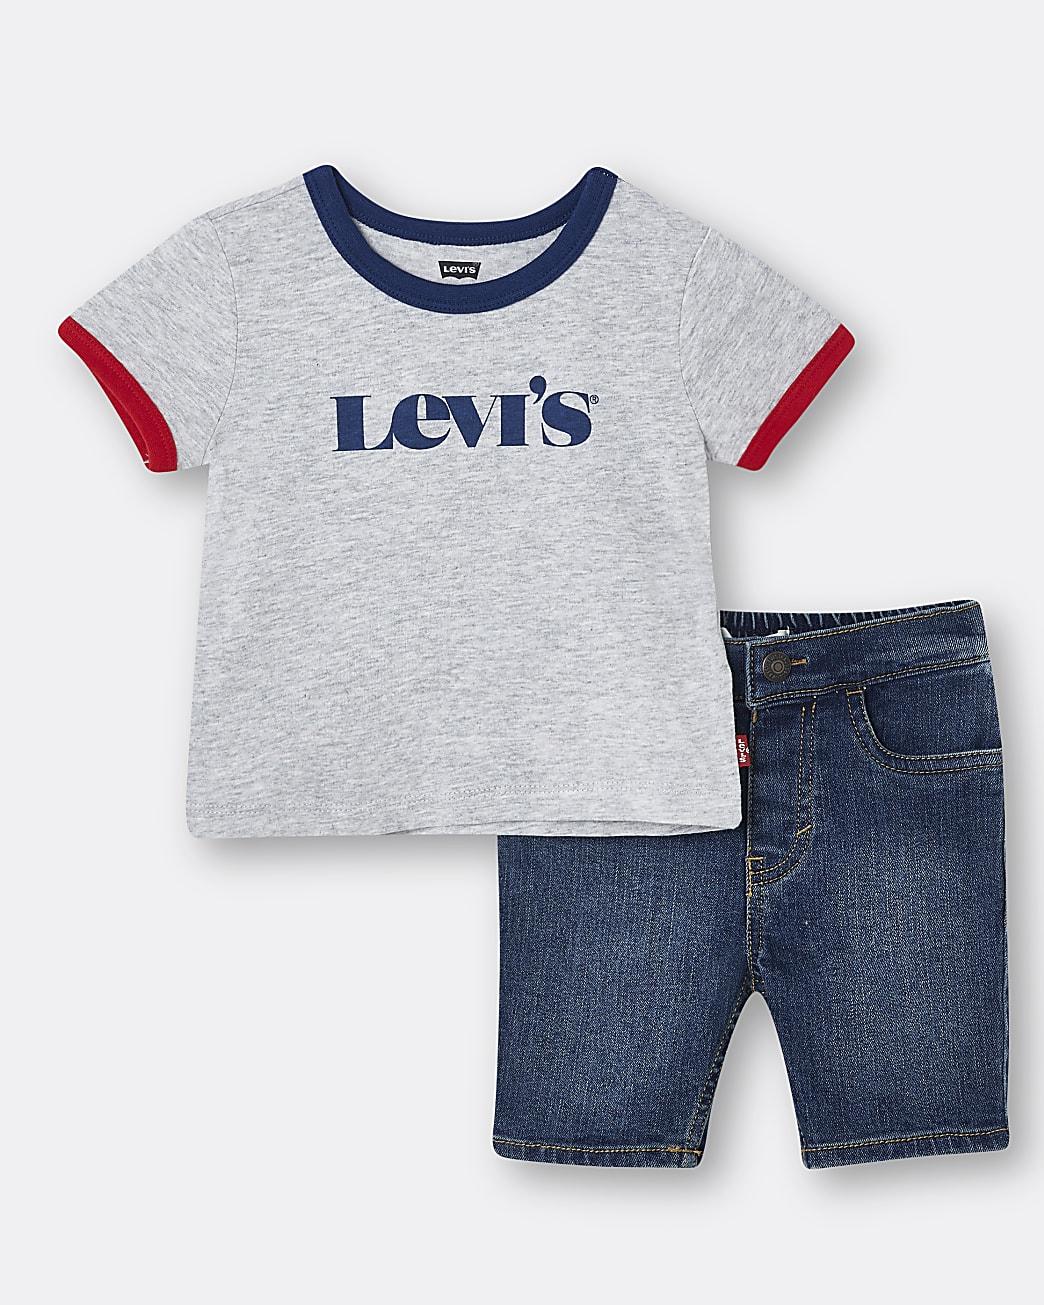 Mini boys grey Levi's denim shorts outfit